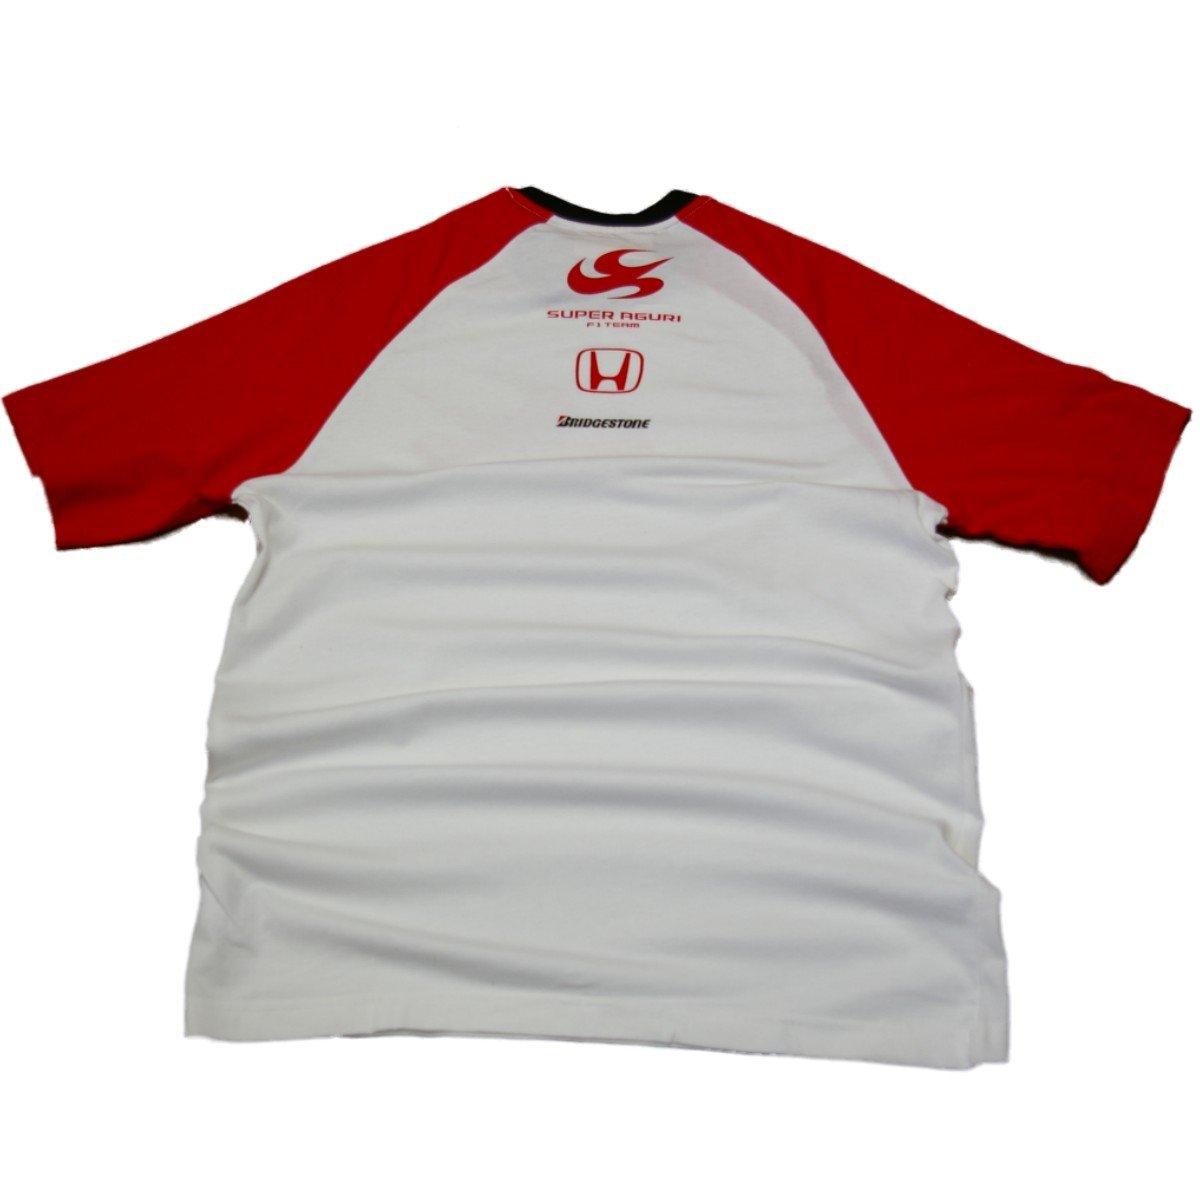 Super Aguri Camiseta Formula 1, Honda F1 R/W New, Hombre, Bianco ...